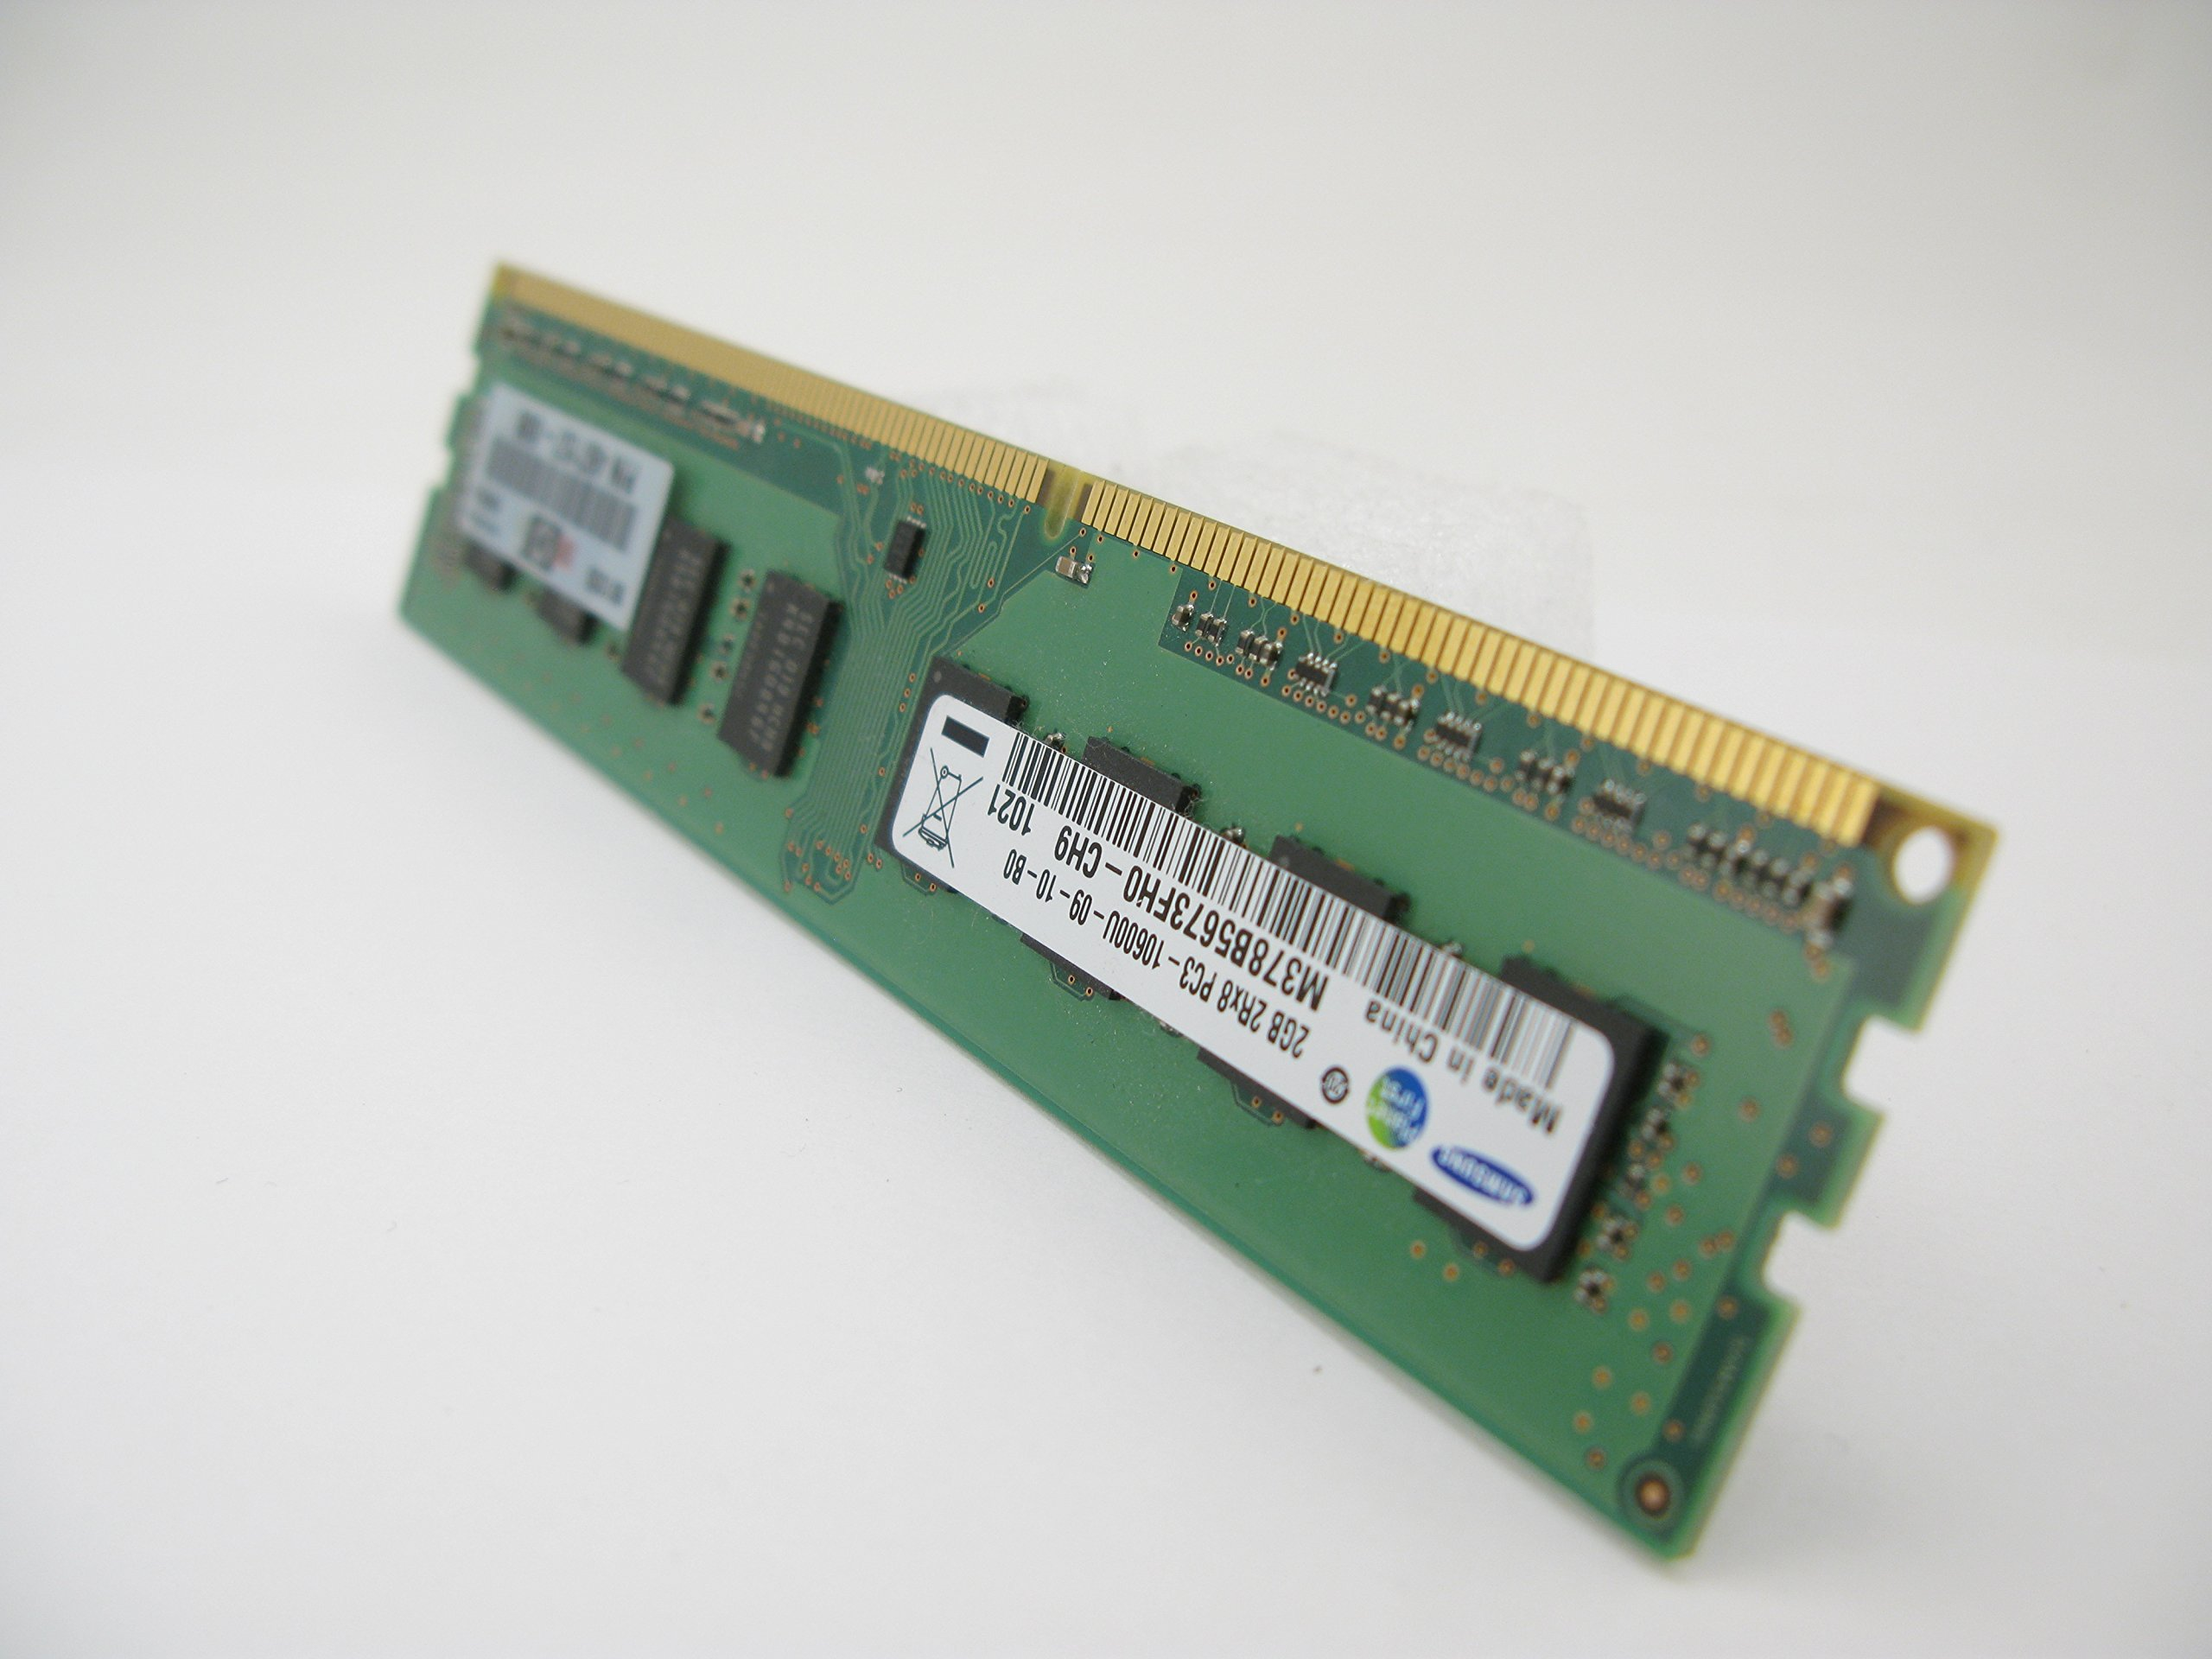 Memoria Ram 2gb Samsung Ddr3 Sdram 240pin Pc3-10600u 1333mhz M378b5673fh0-ch9